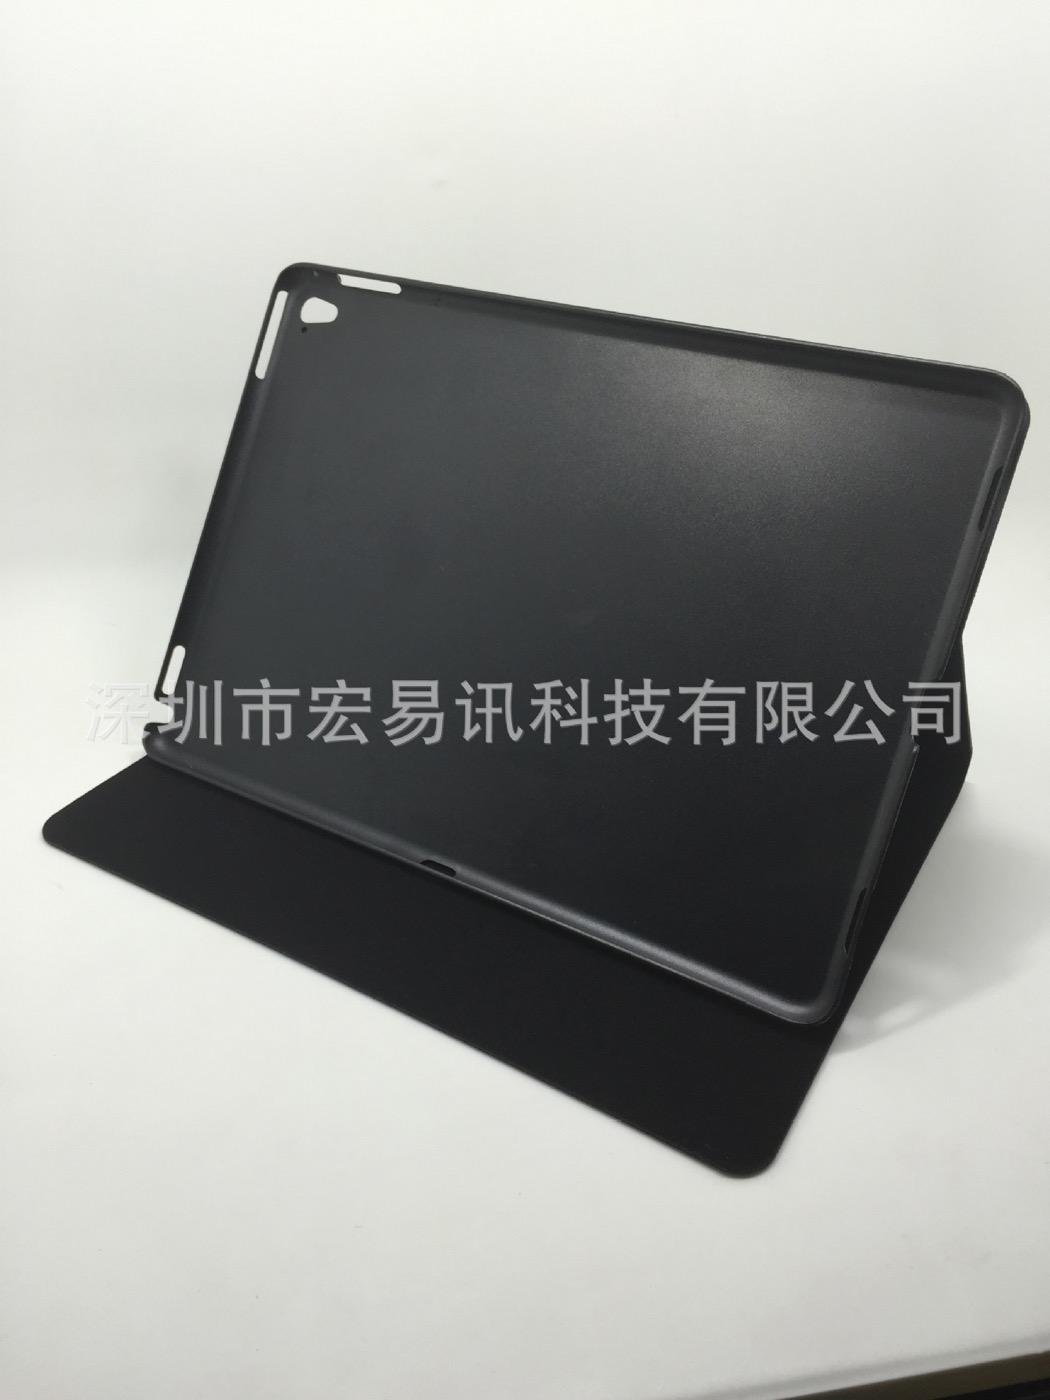 th_accessoire-ipad-air3-ipad7-coque-protection-01